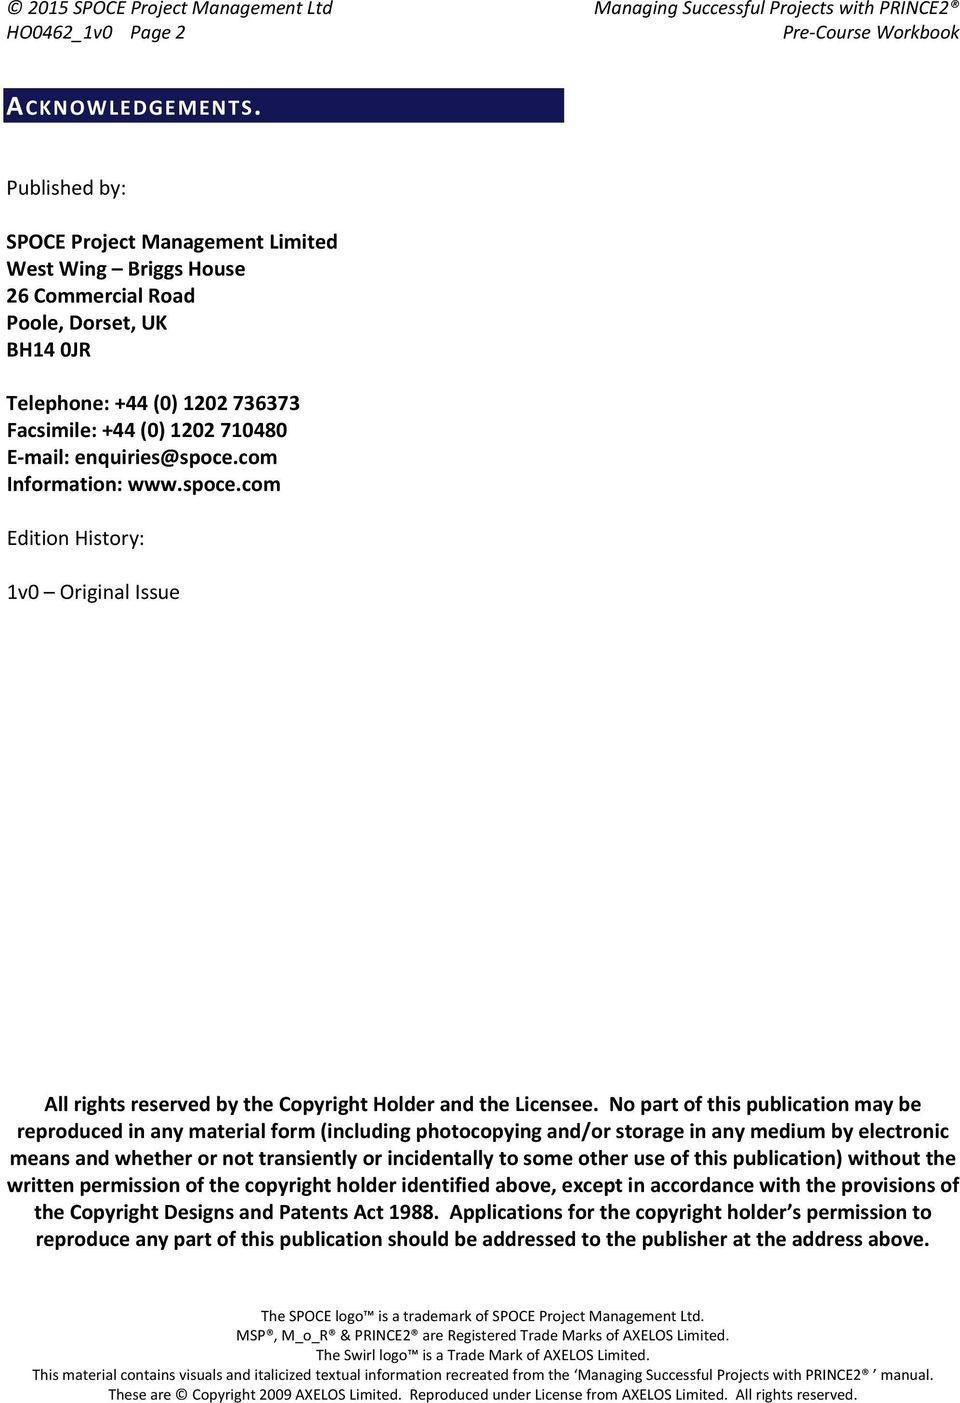 hight resolution of enquiries spoce com information www spoce com edition history 1v0